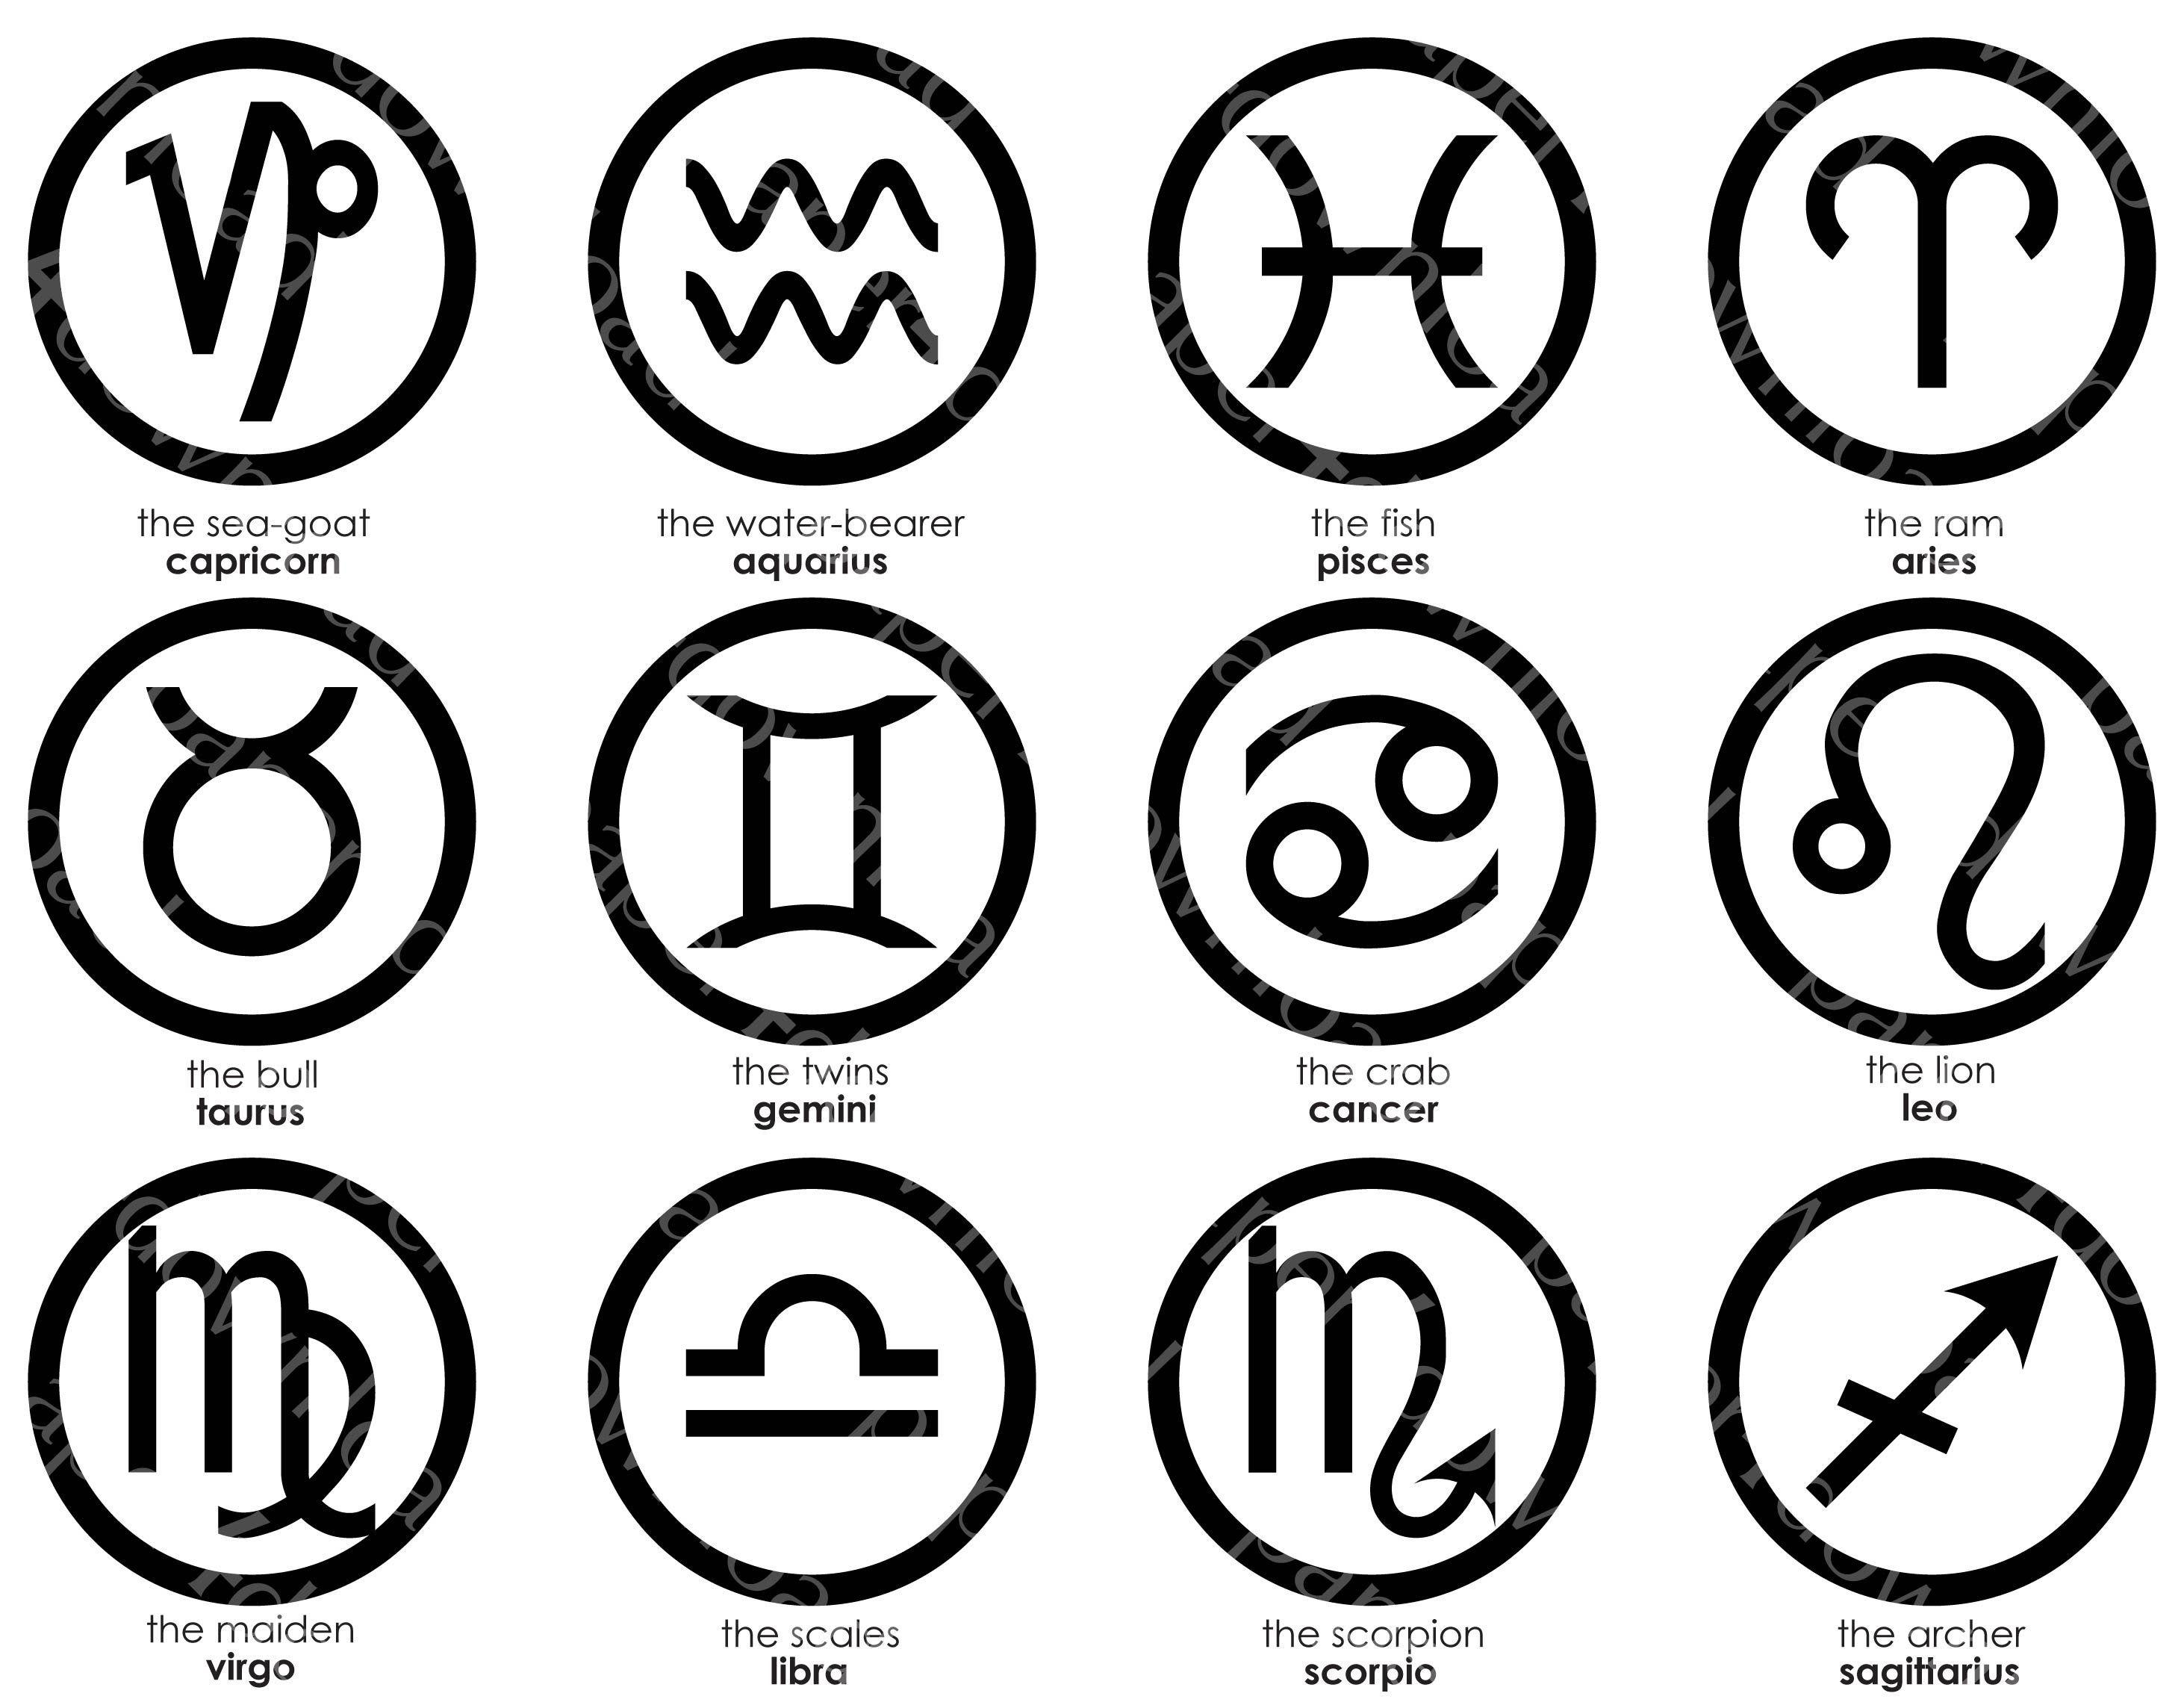 Zodiac Symbols Black On White Medallion Badge Clipart Digital Collage Png Printable Instant Download Zodiac Symbols Clip Art Digital Collage